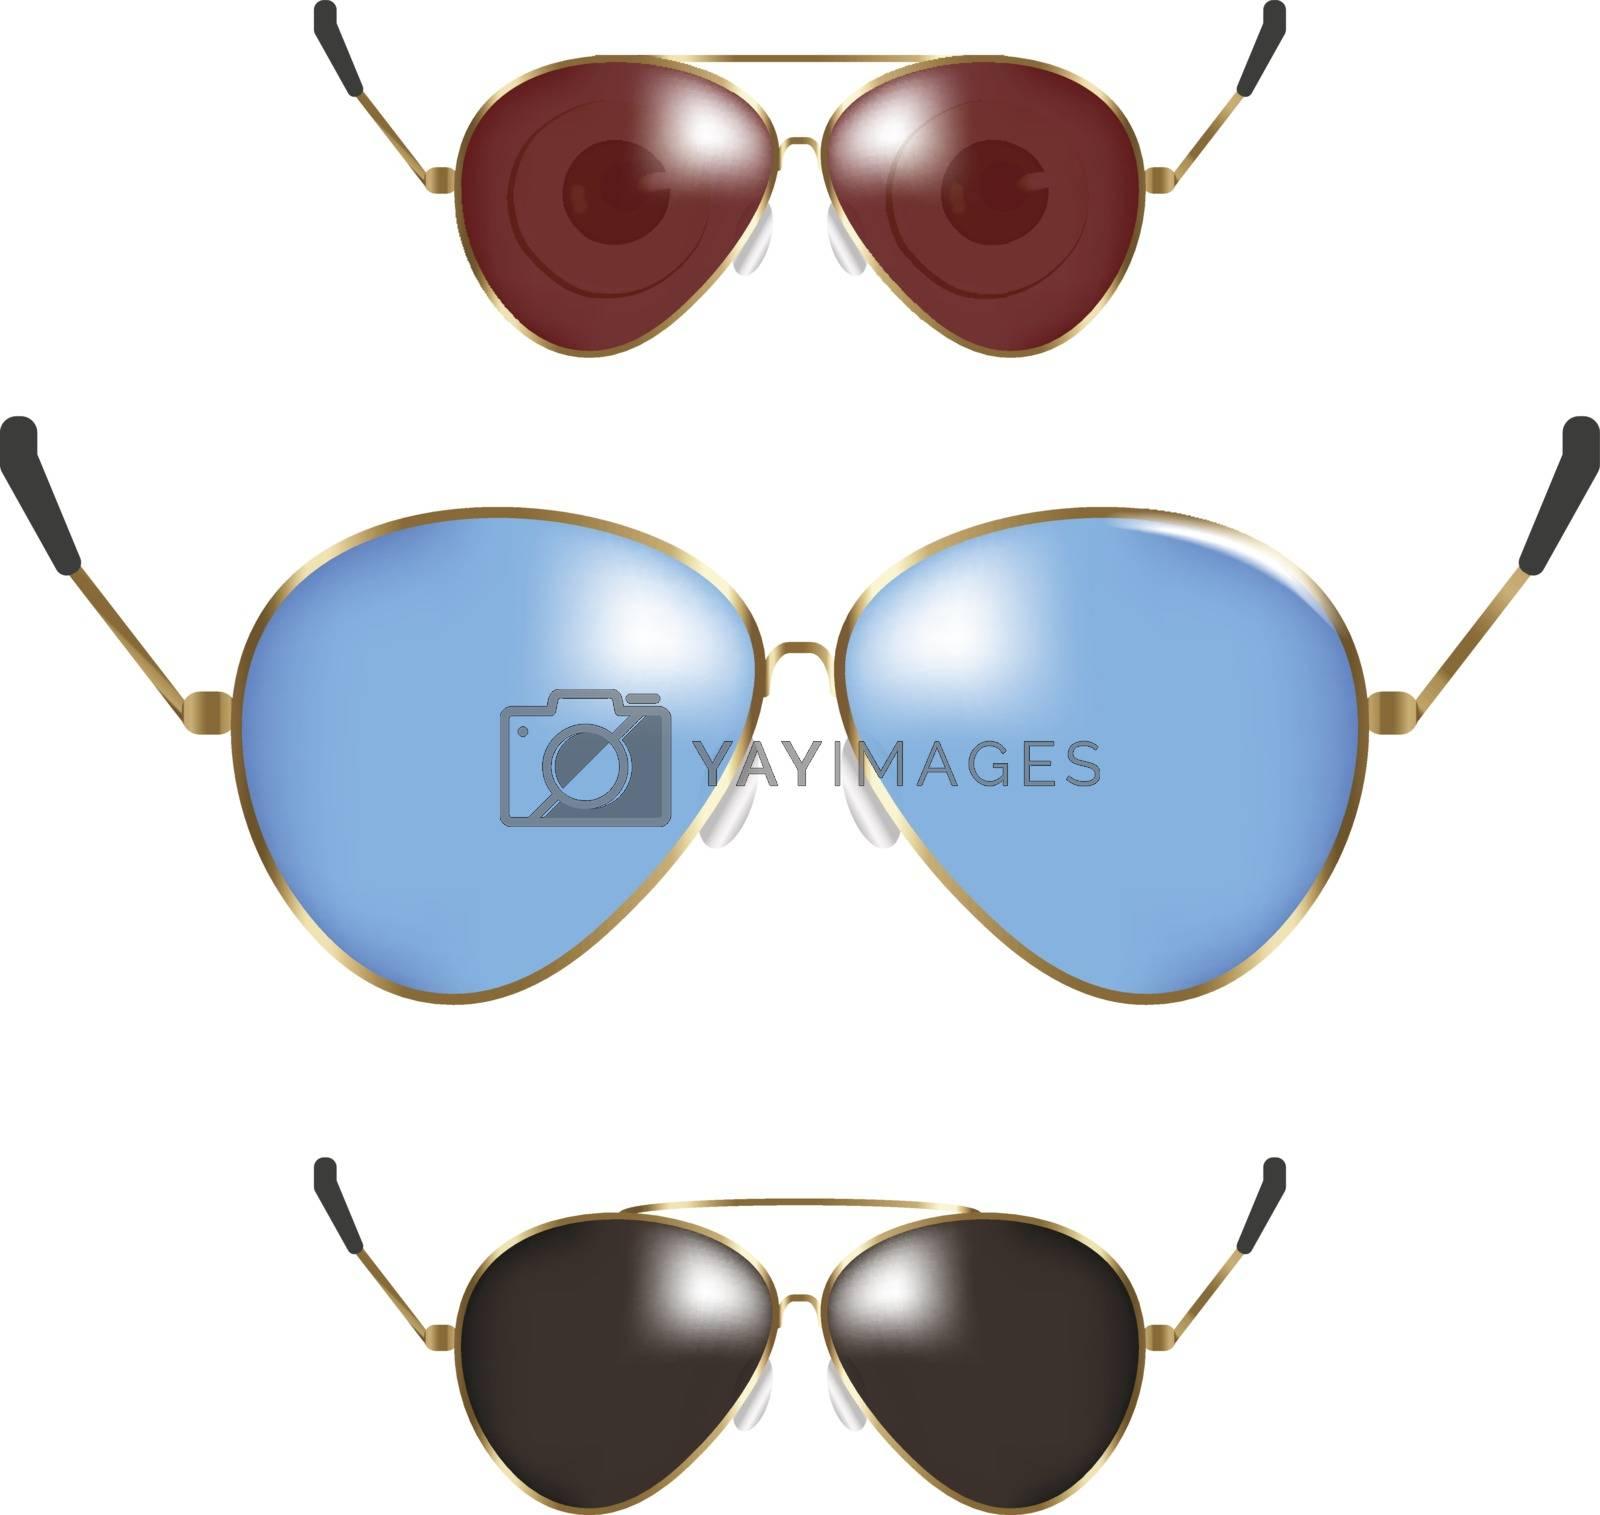 Classic sunglasses set. Summer eyeglasses. Retro fashion collection. Summer vacation item. Semitransparent sunglasses for tropical trip. Vector illustration.